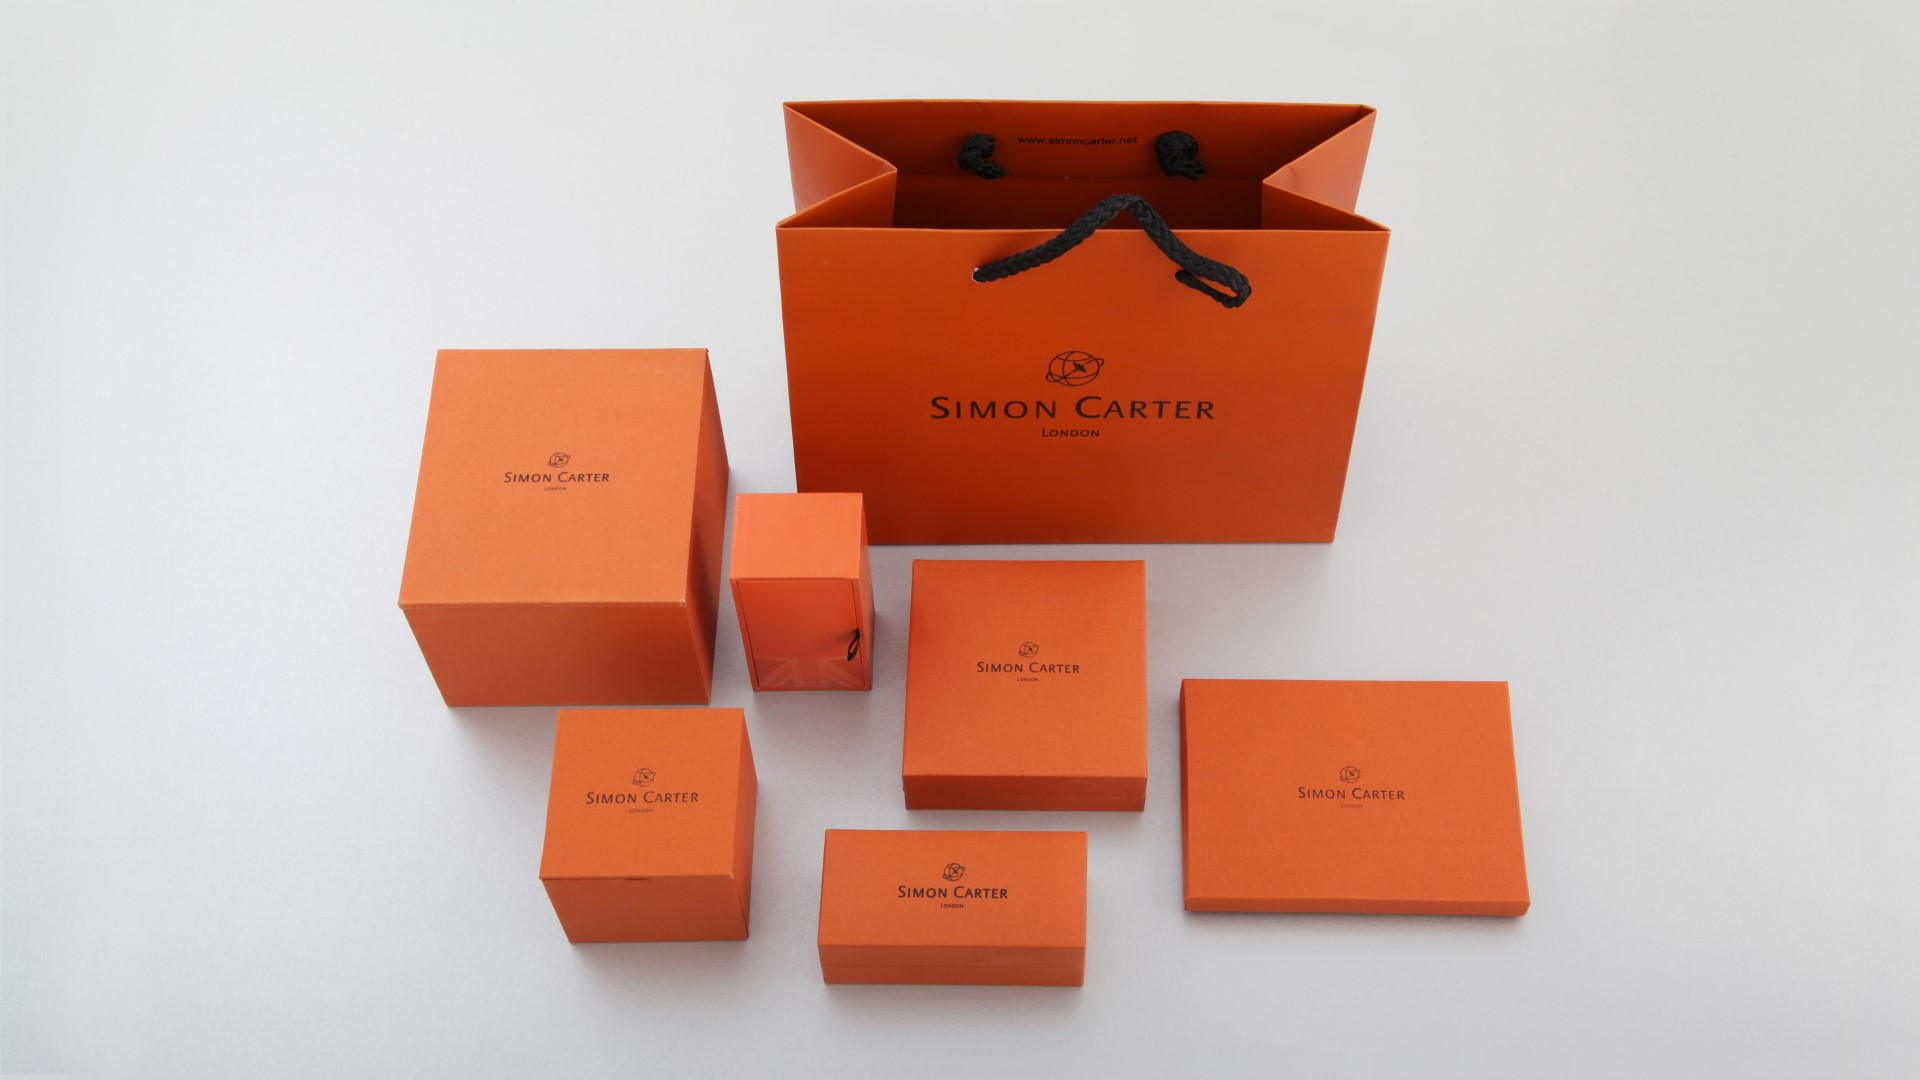 Simon Carter Bag and Men's Jewellery Boxes